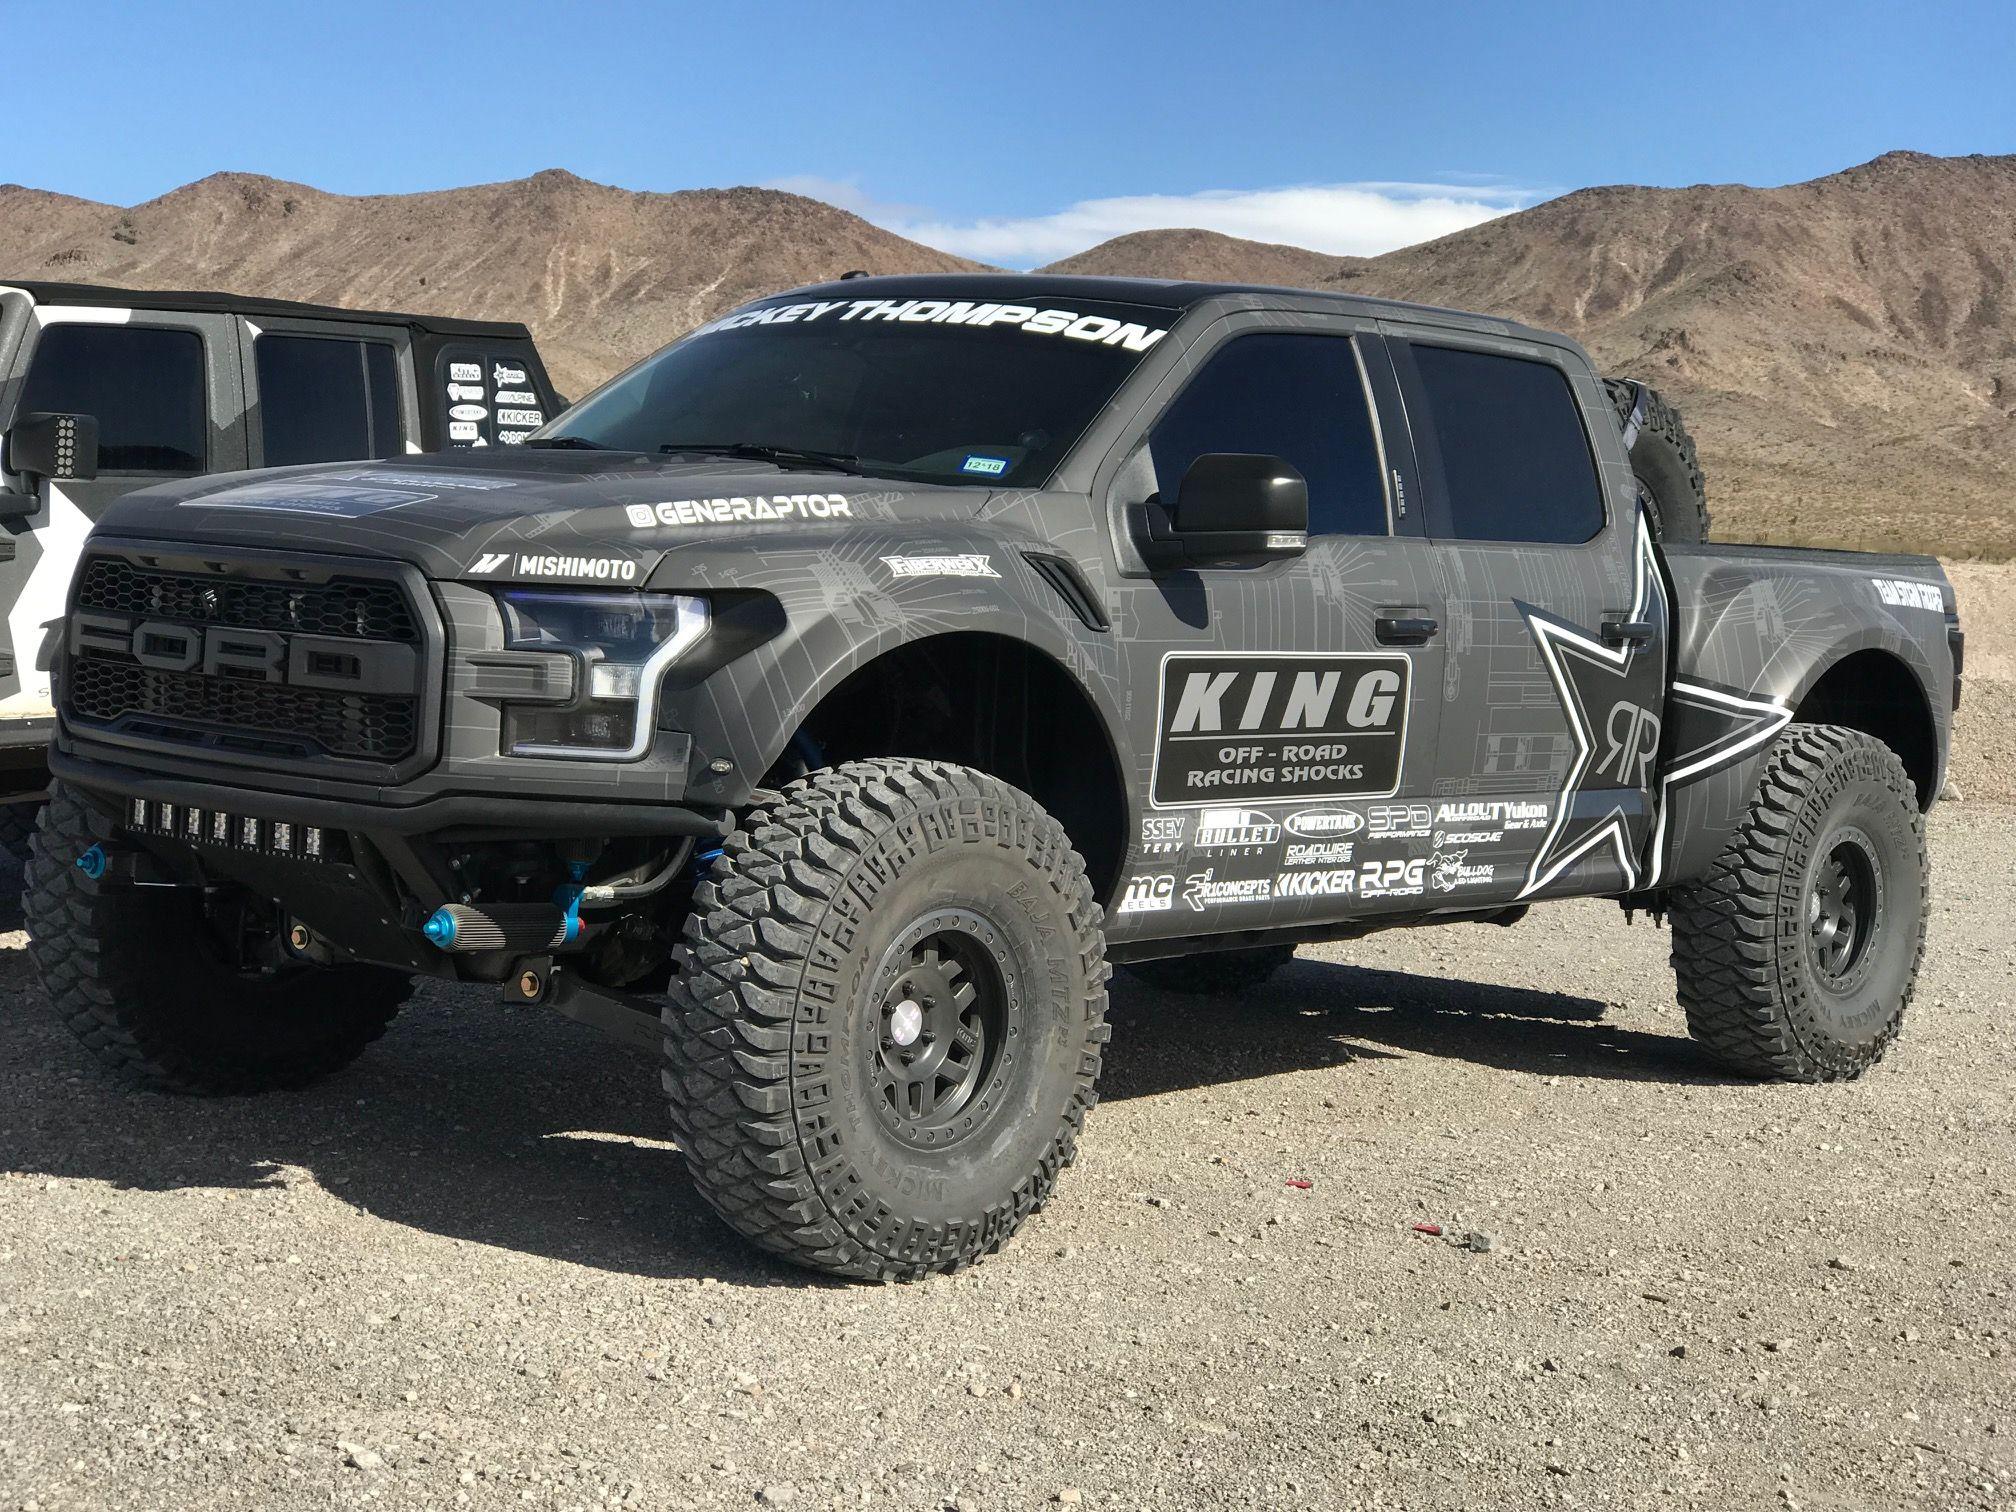 2017 Ford Raptor Deberti Fenders With Images Ford Raptor